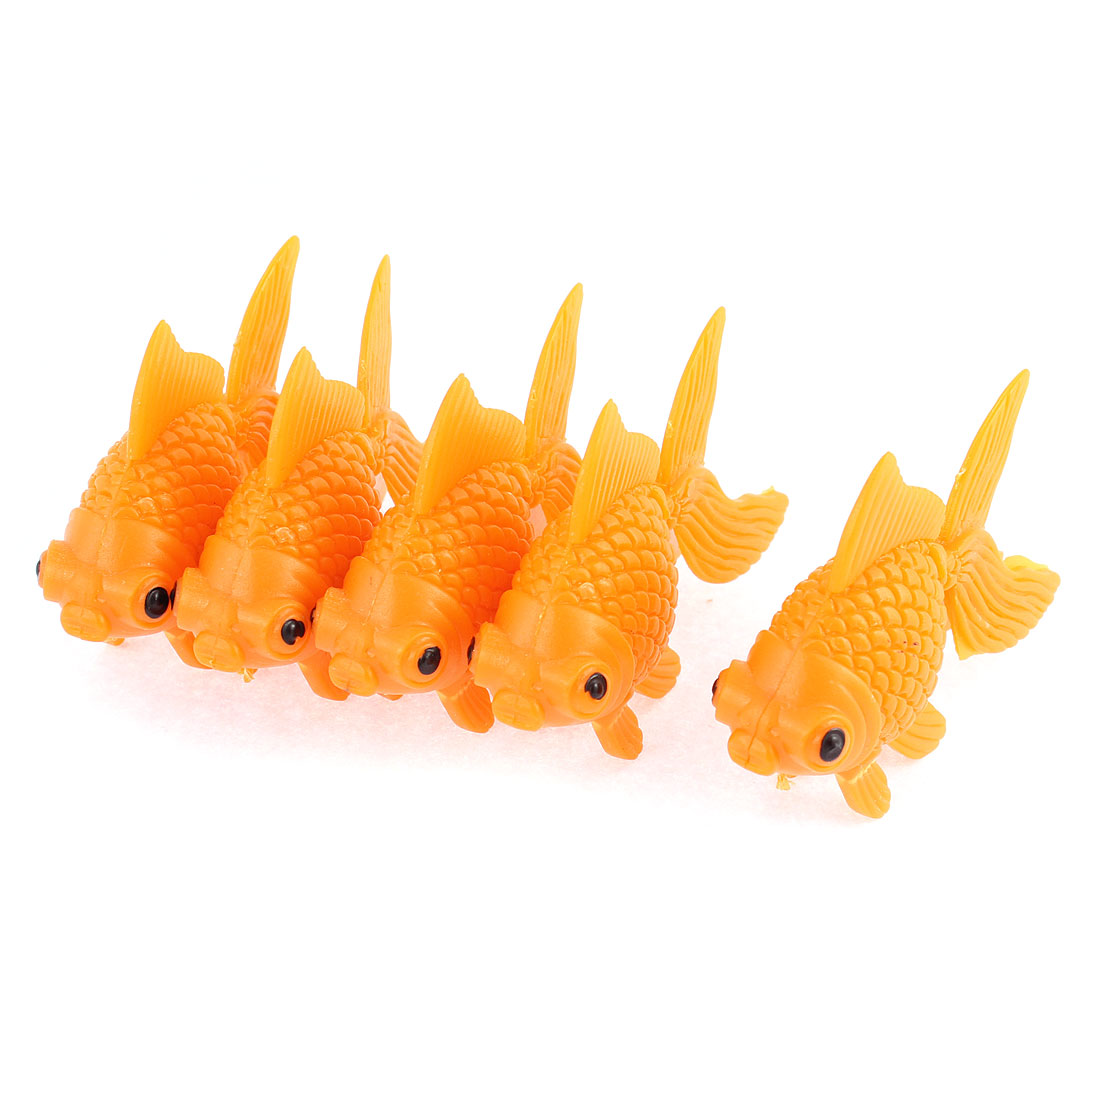 Orange Plastic Fish Tank Ornament Artificial Swing Tail Goldfish 5 Pcs